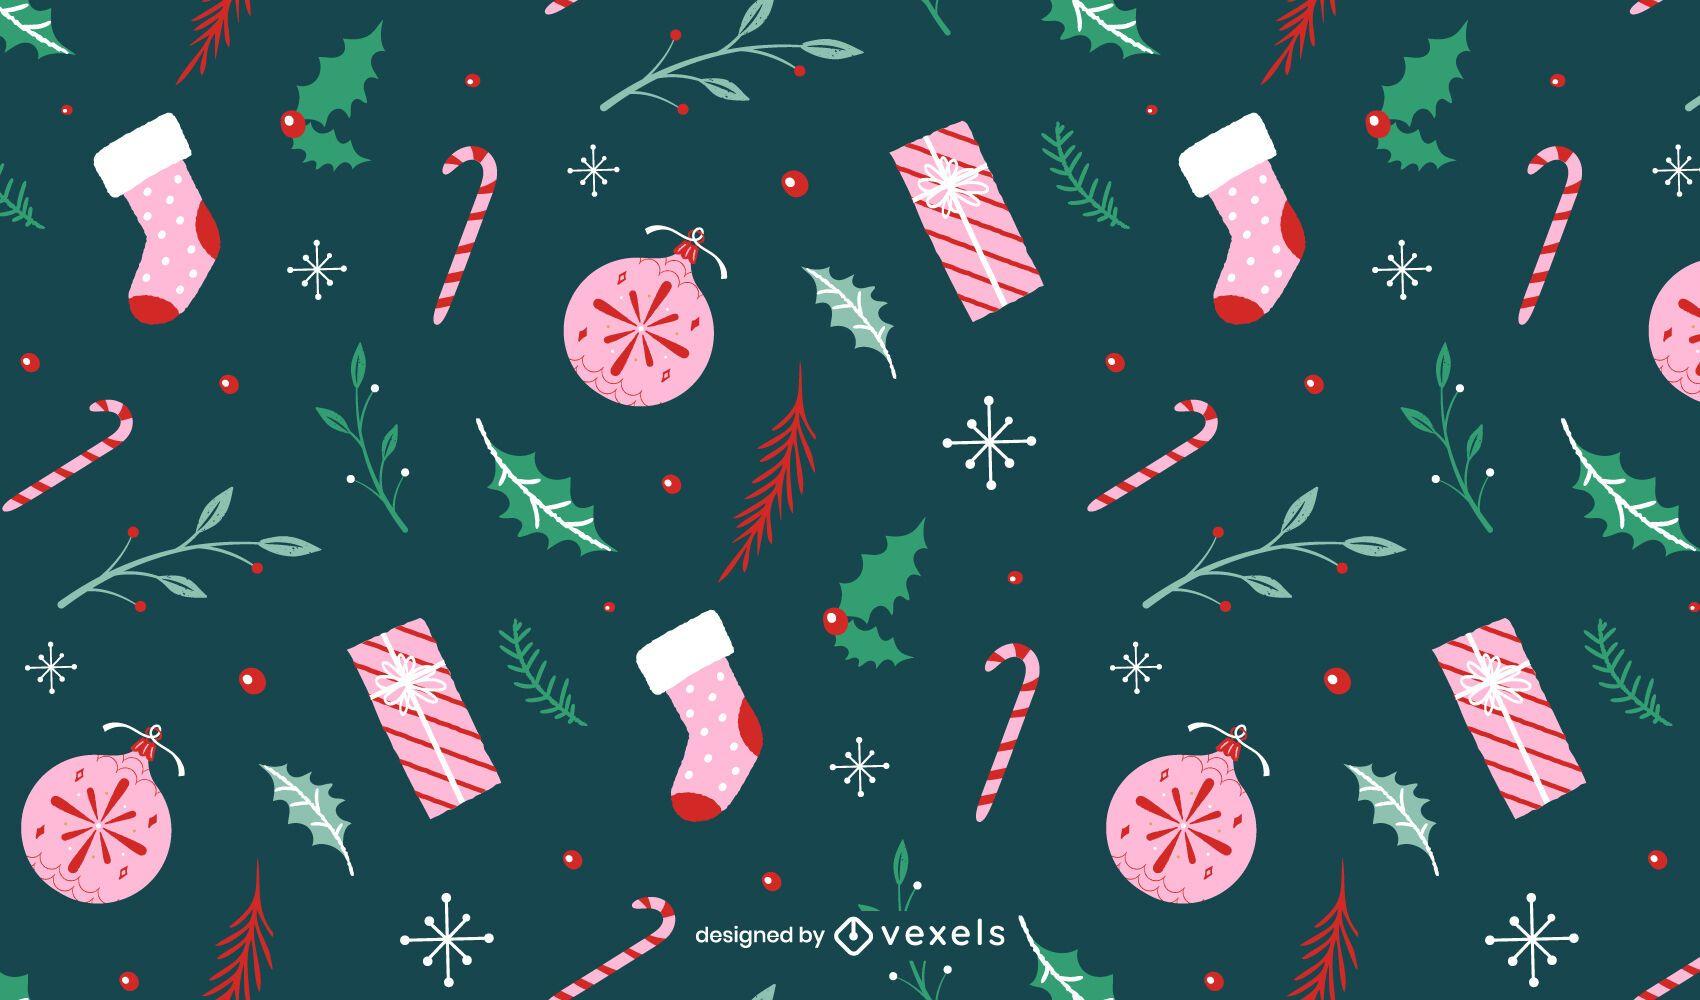 Christmas holiday pattern design